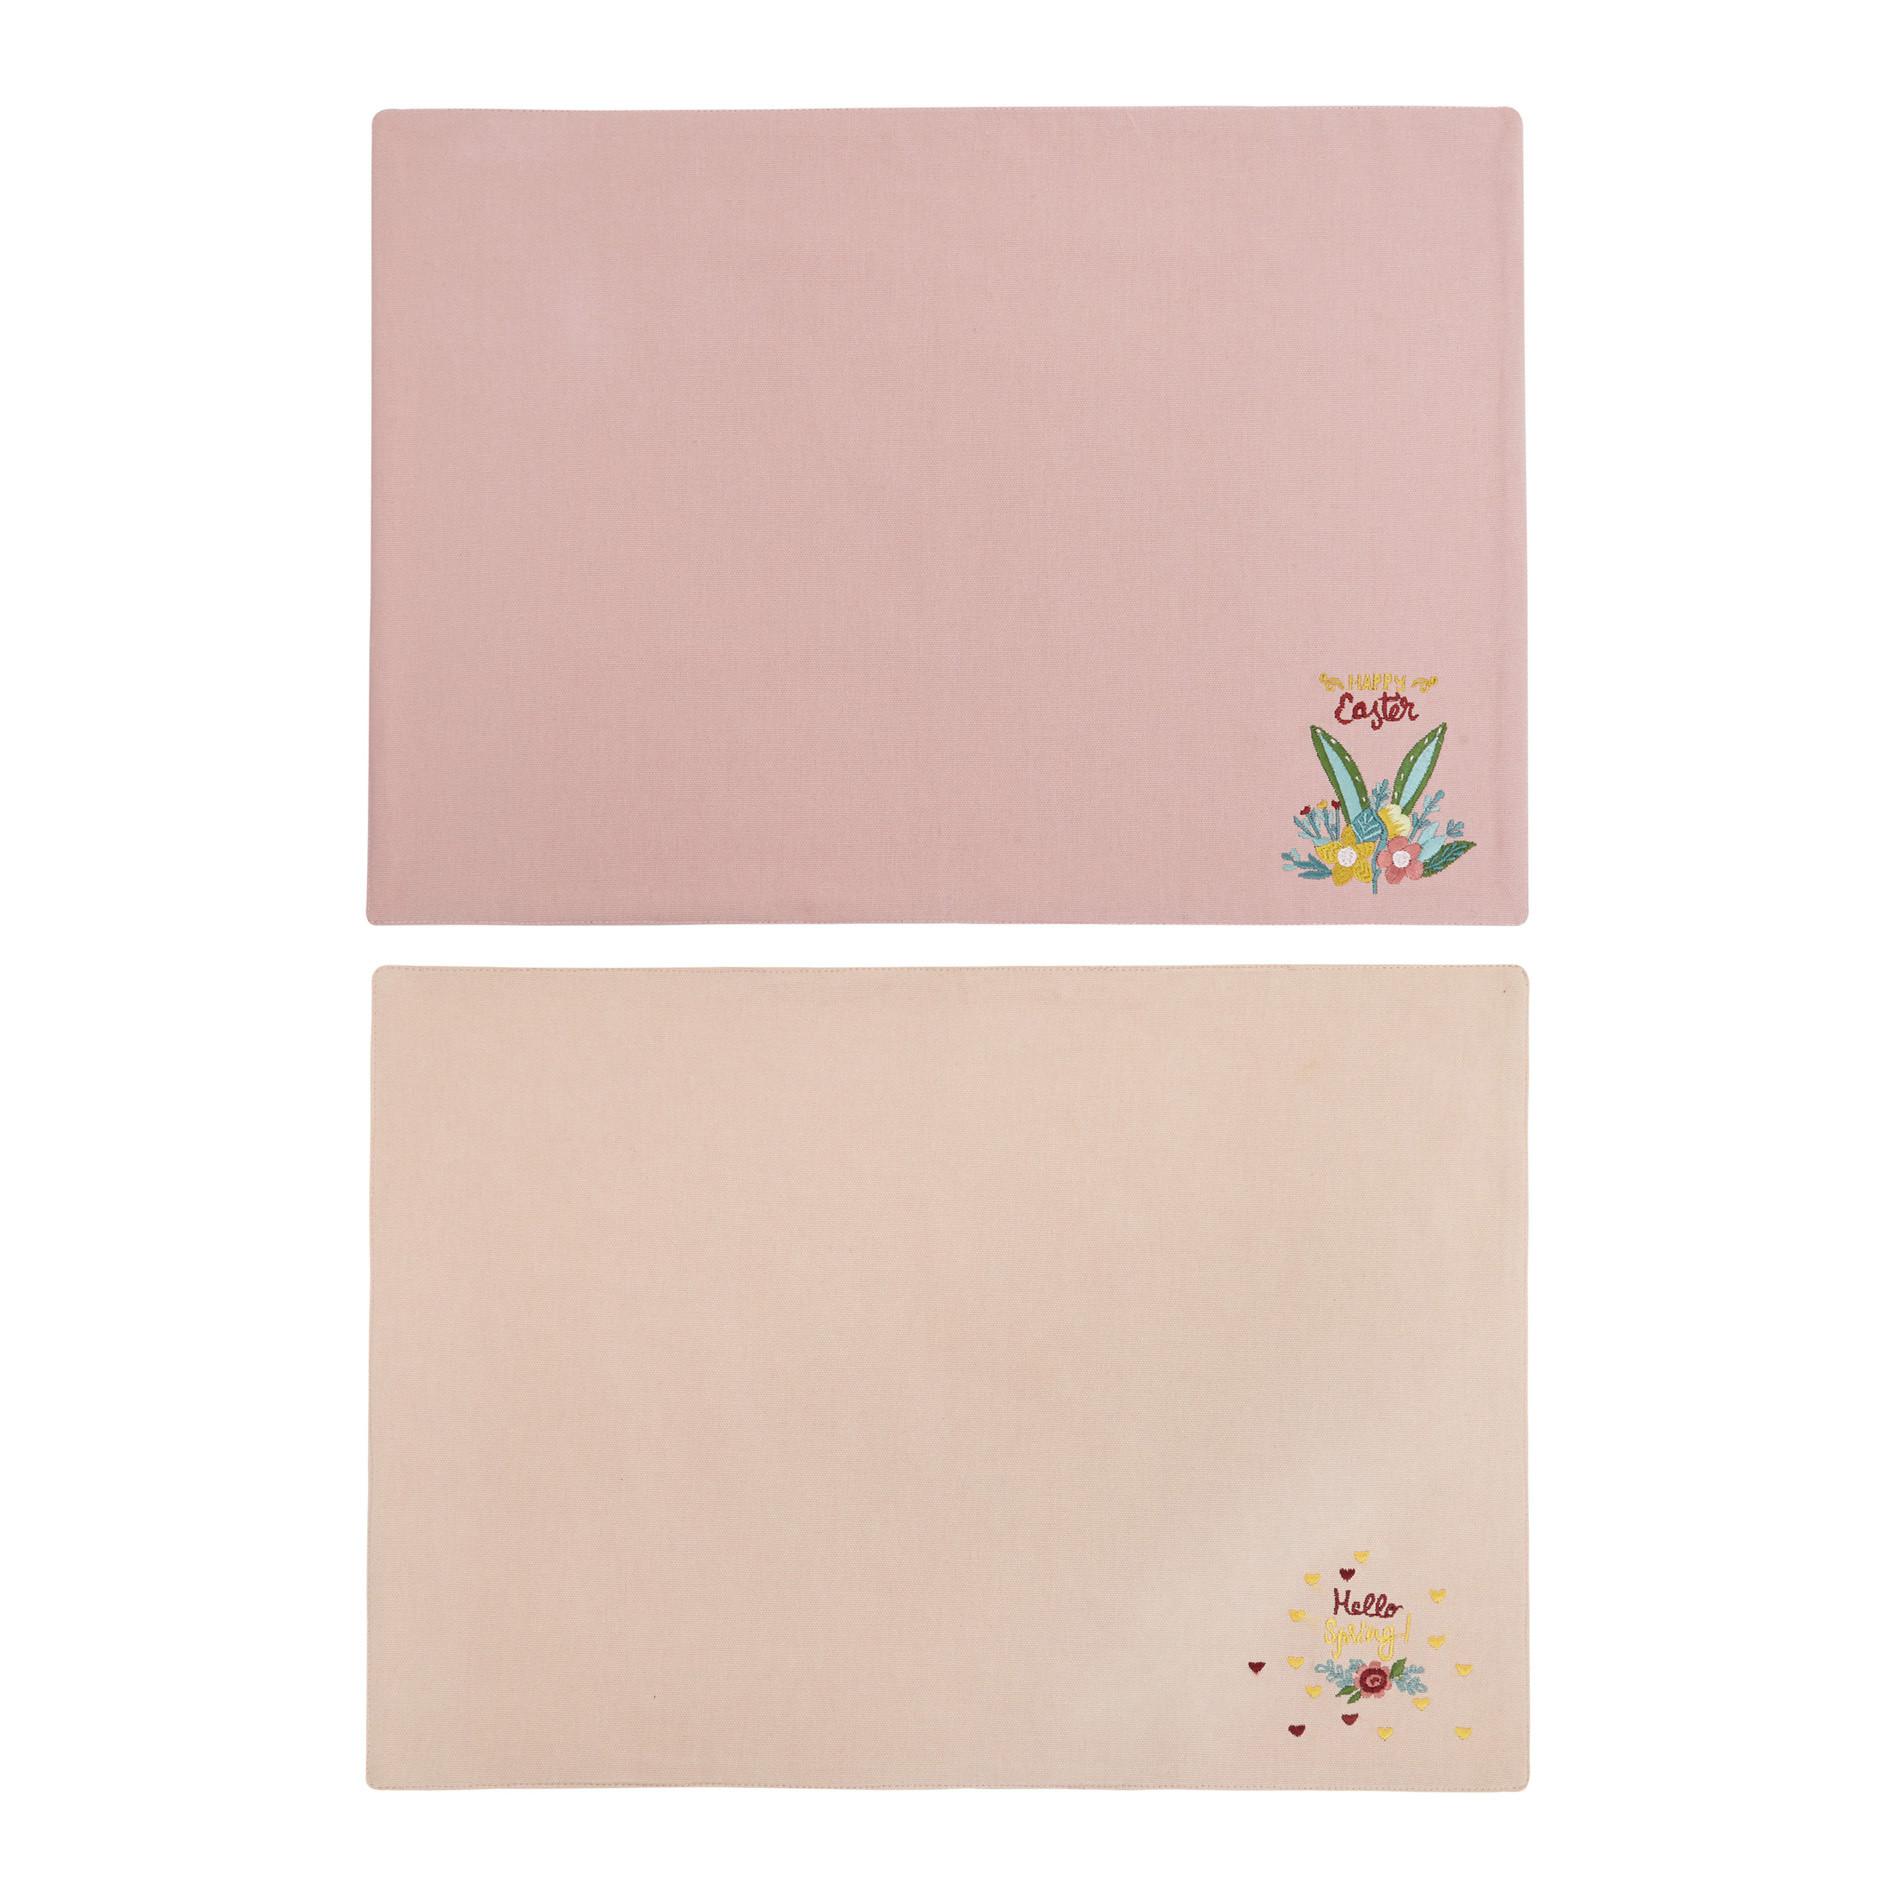 Set 2 tovagliette puro cotone ricamo pasquale, Rosa, large image number 0